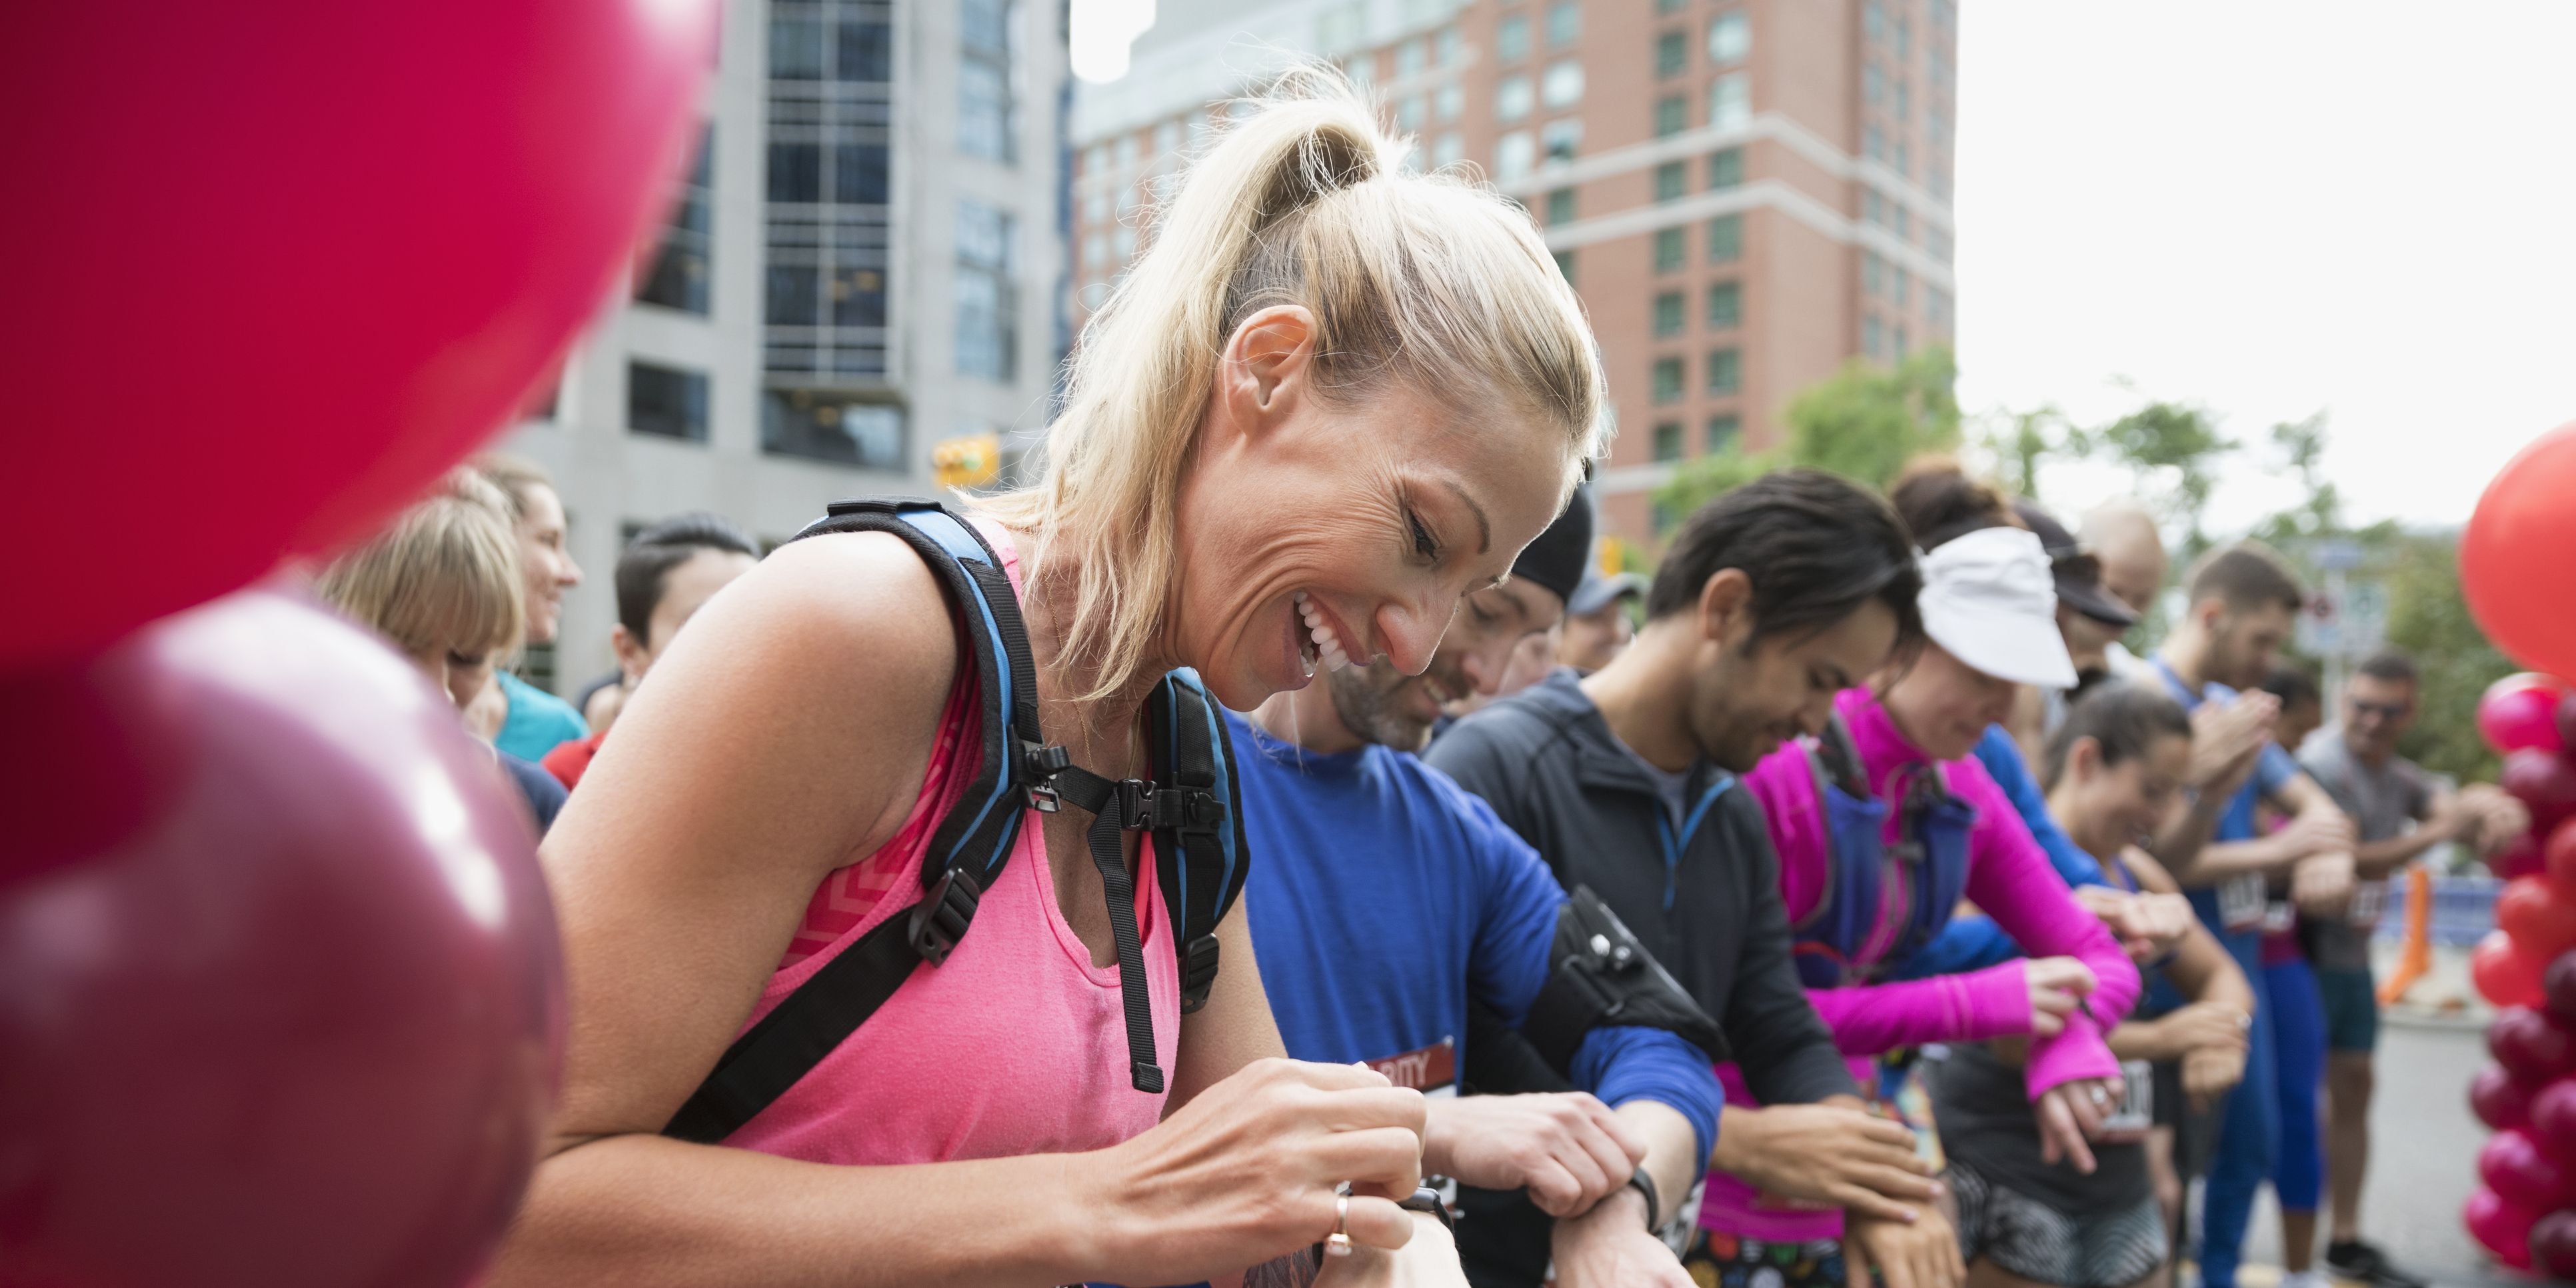 Smiling female marathon runner ready, preparing smart watch at starting line on urban street